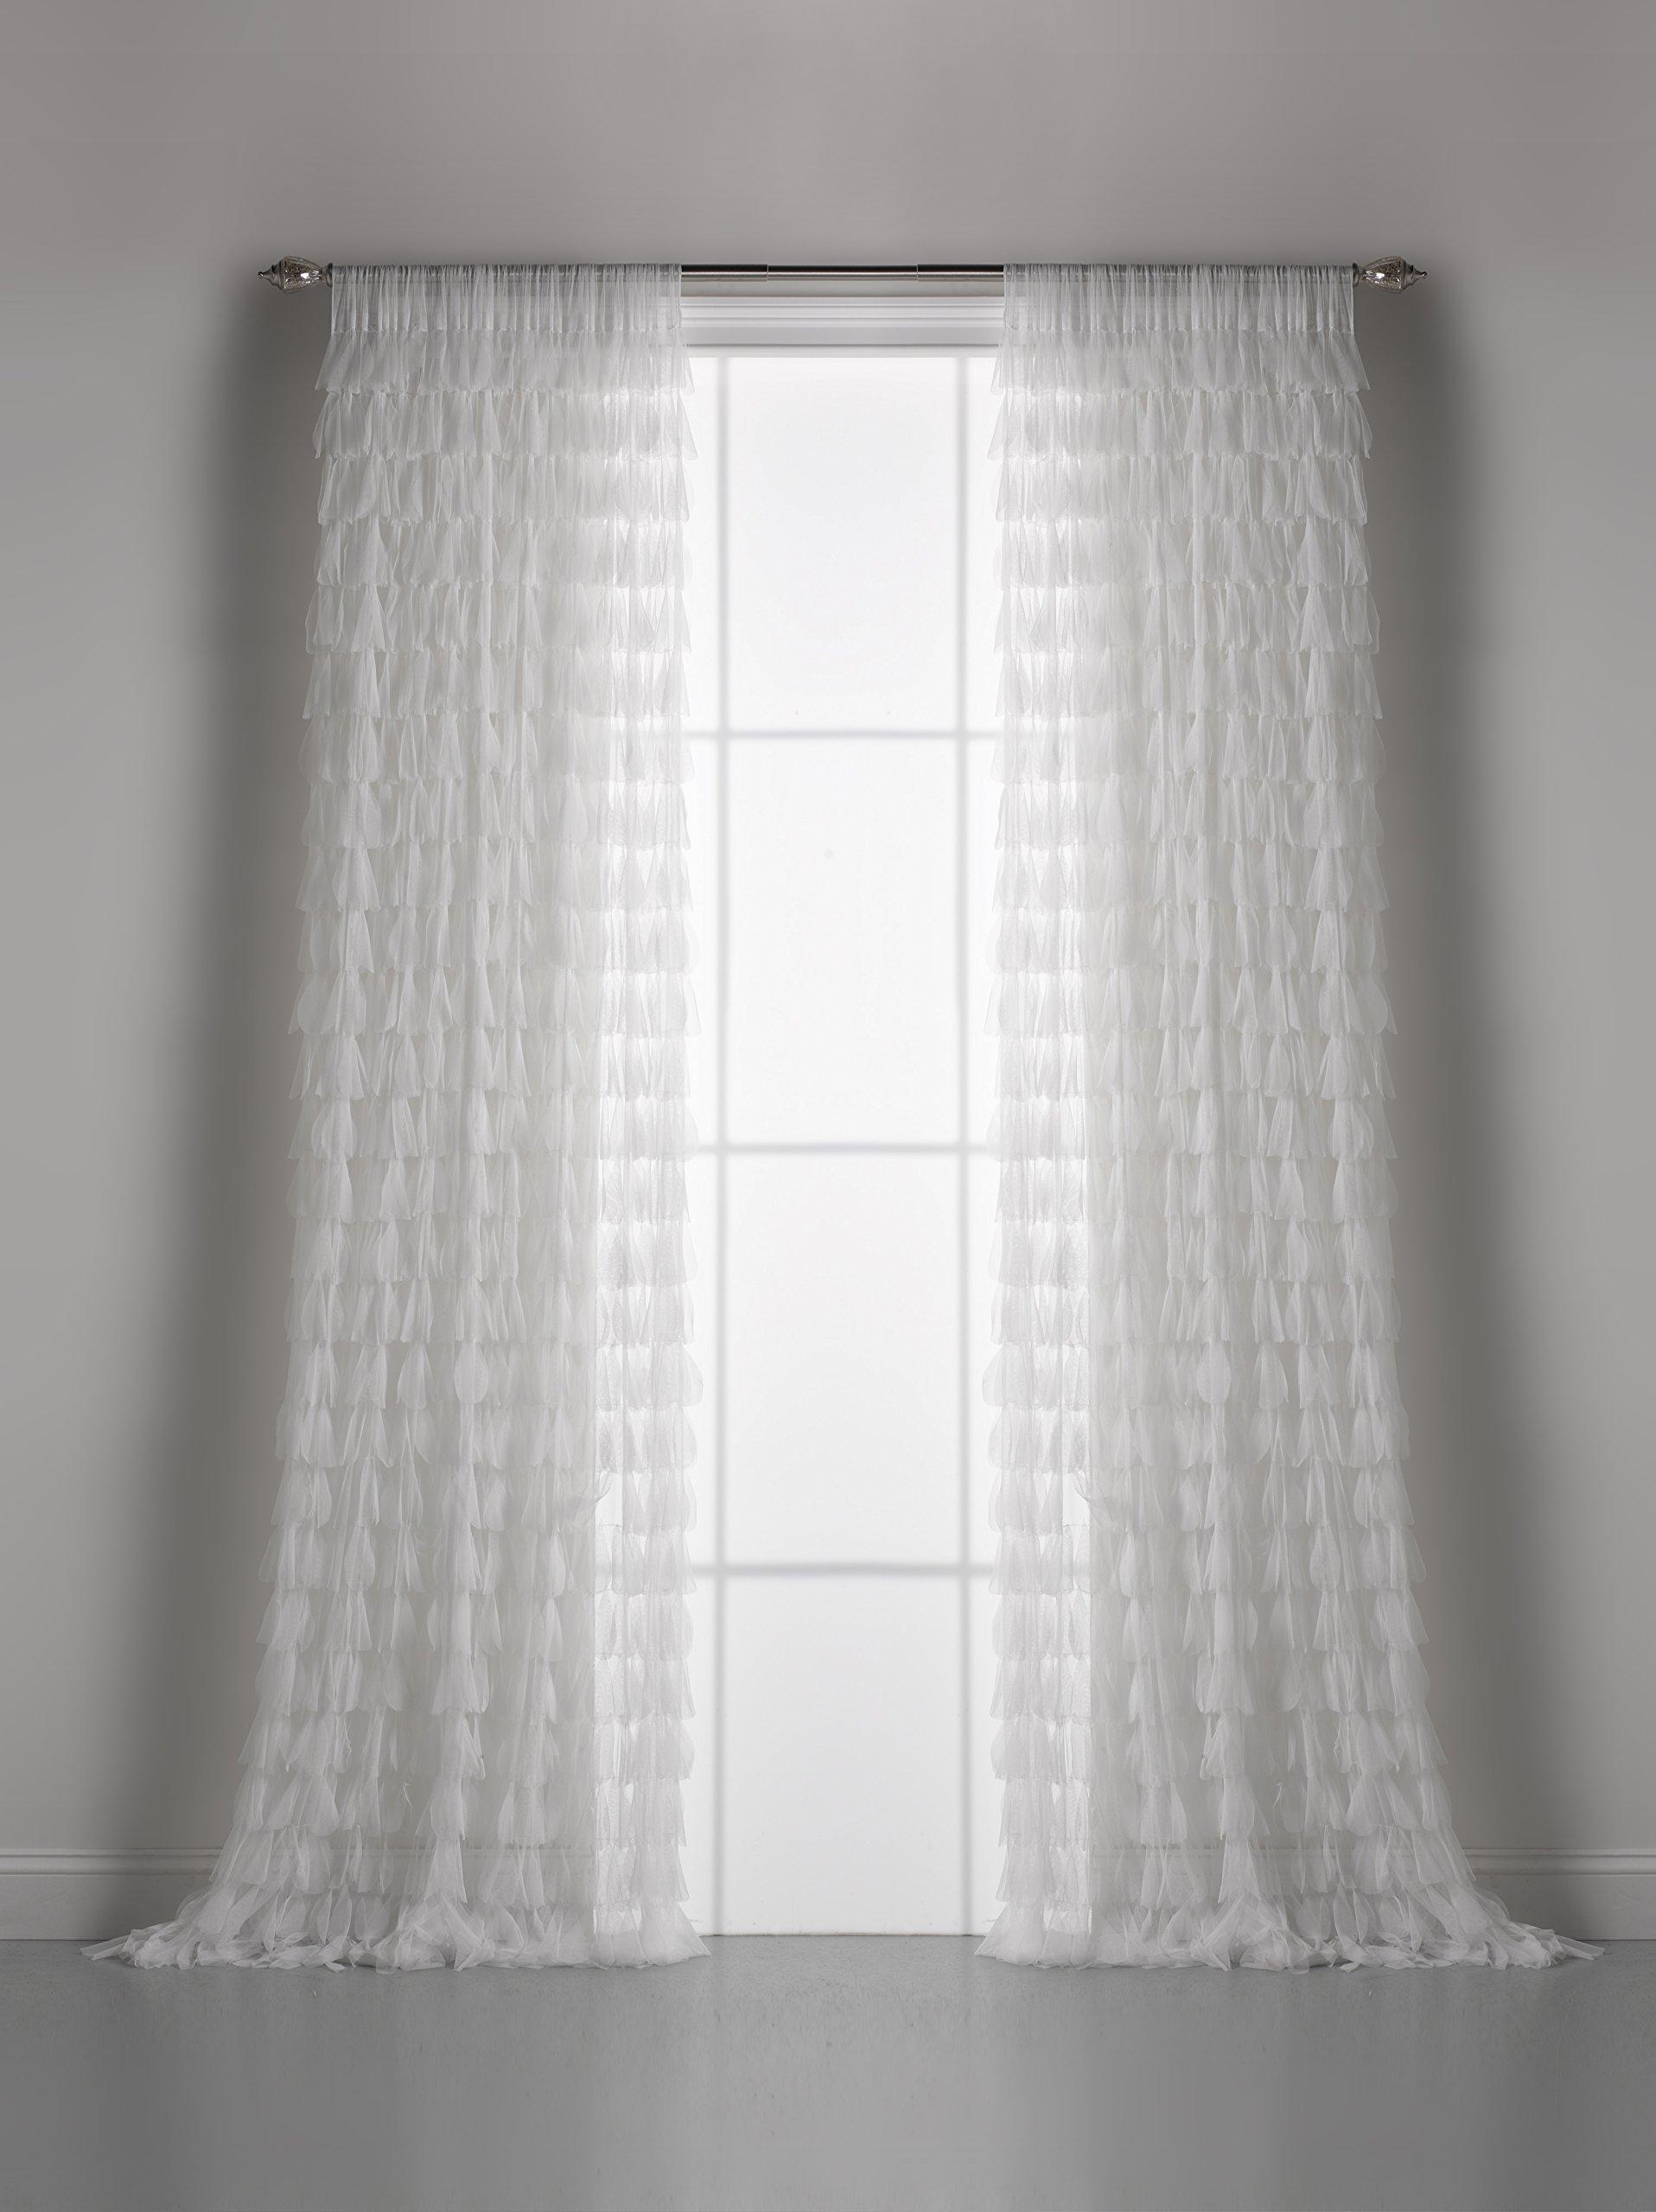 Couture Dreams Chichi Petal Window Curtain, White, 96 Inch